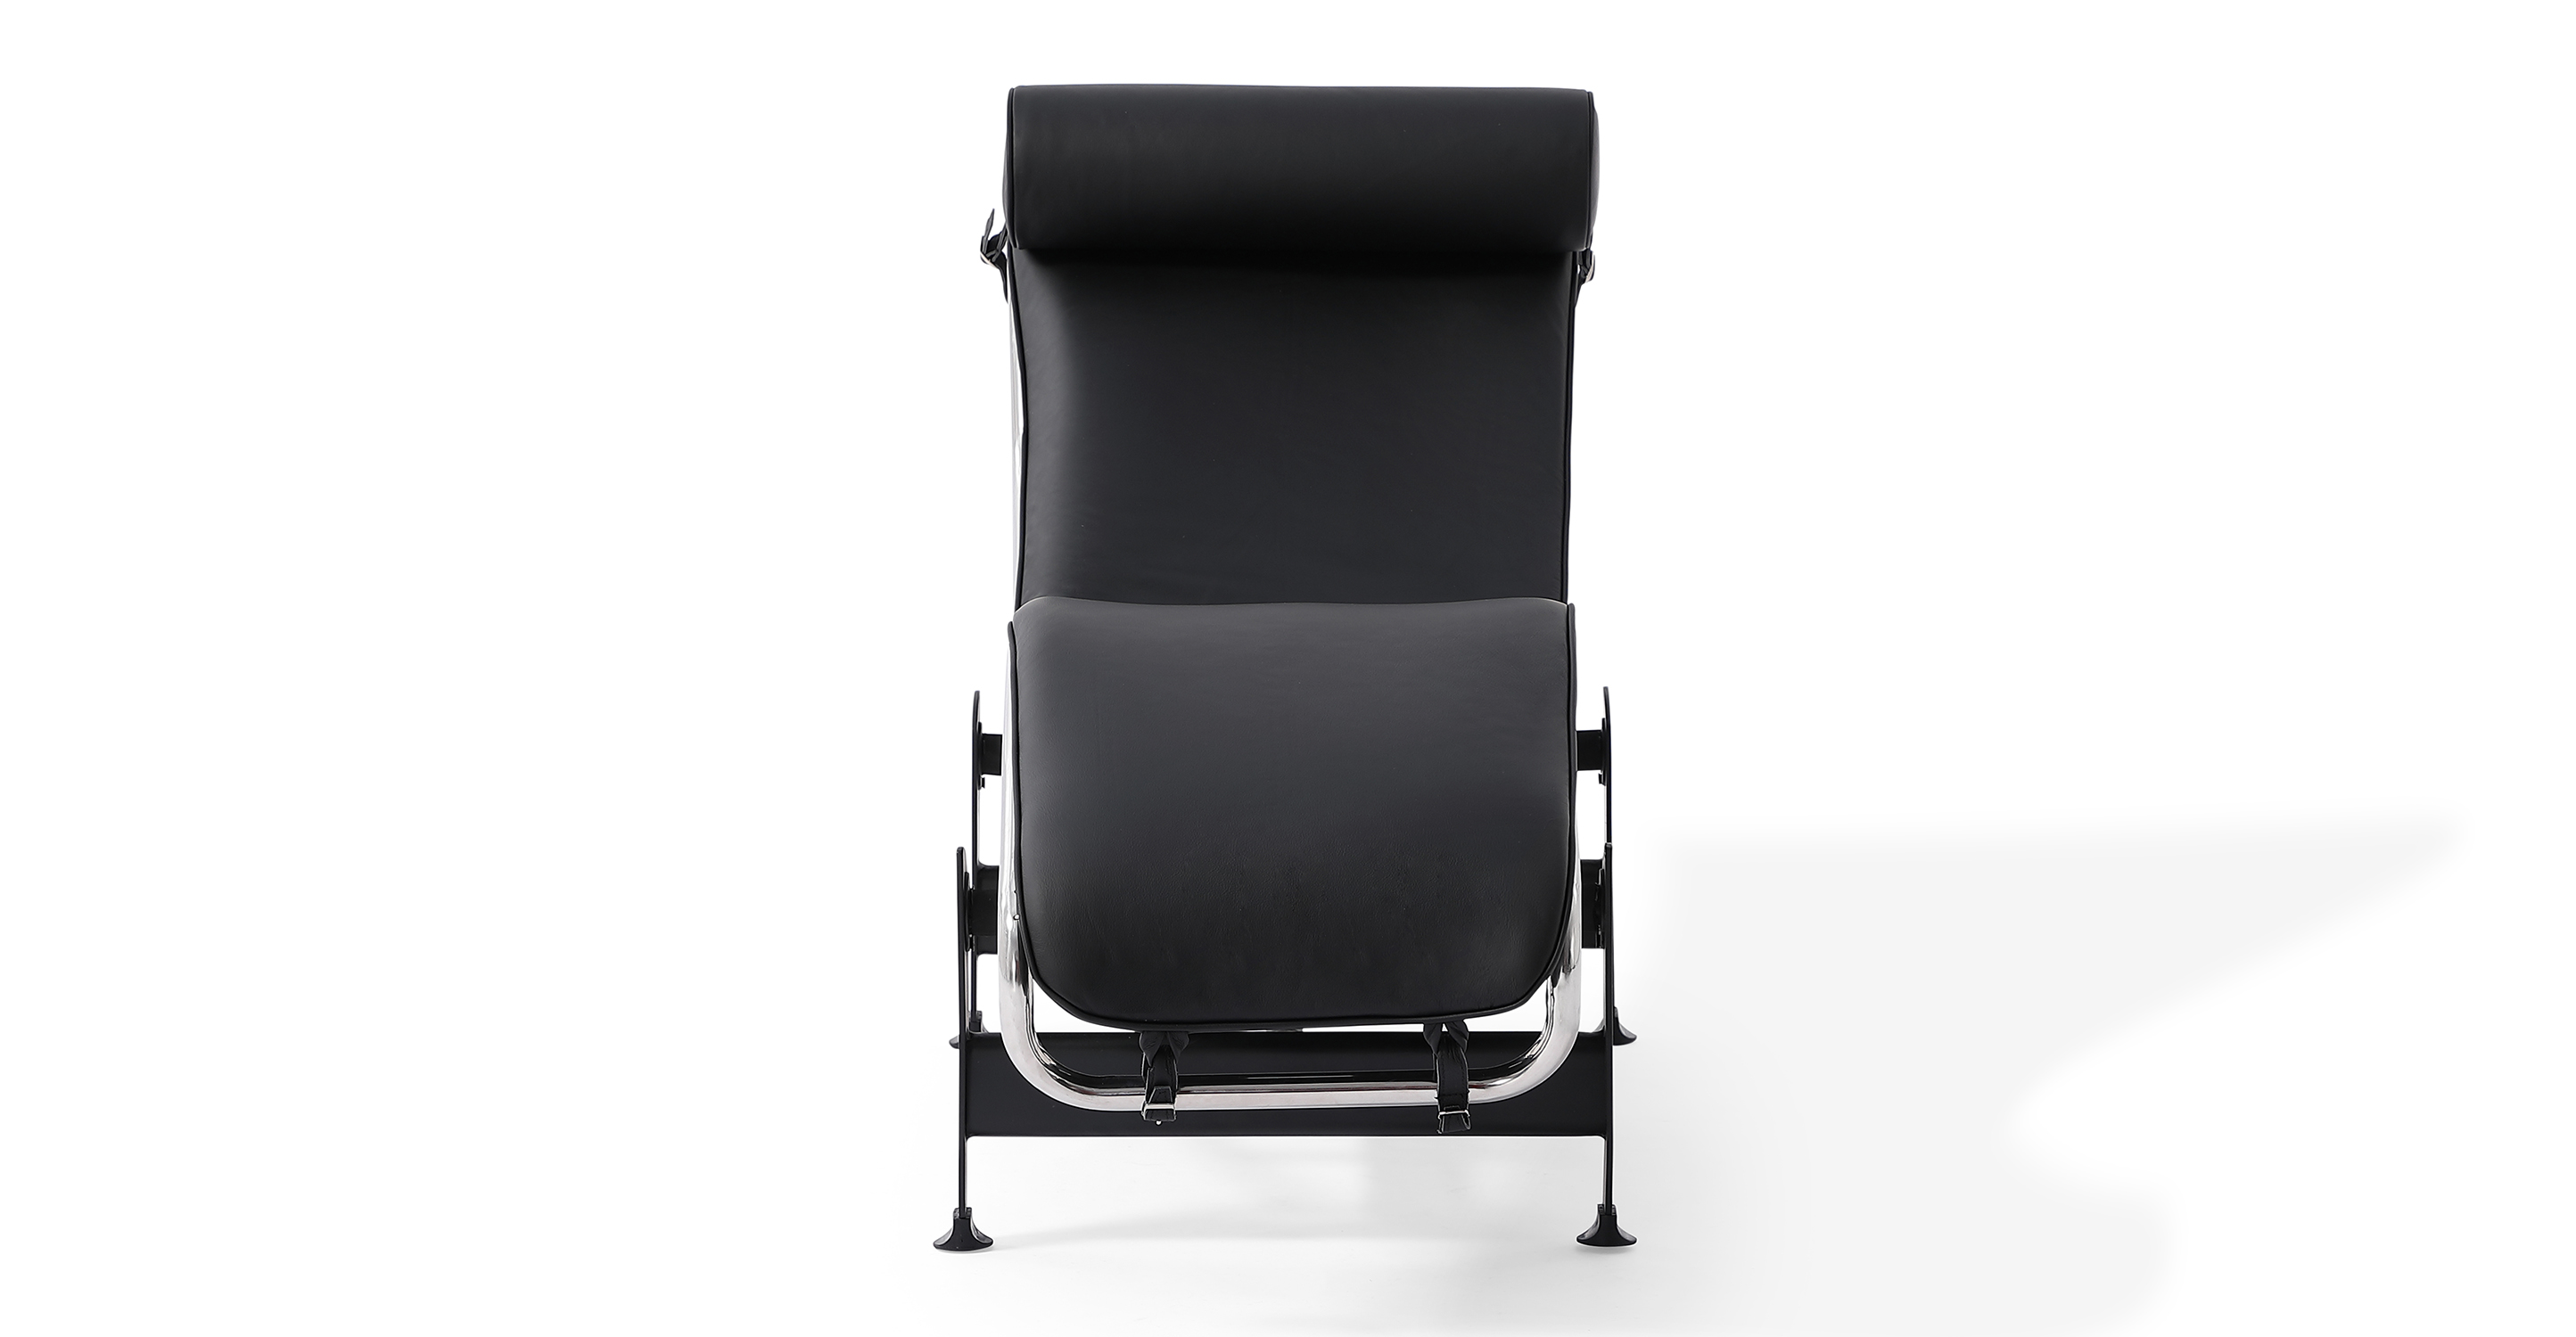 Gravity Chaise Lounge, Black